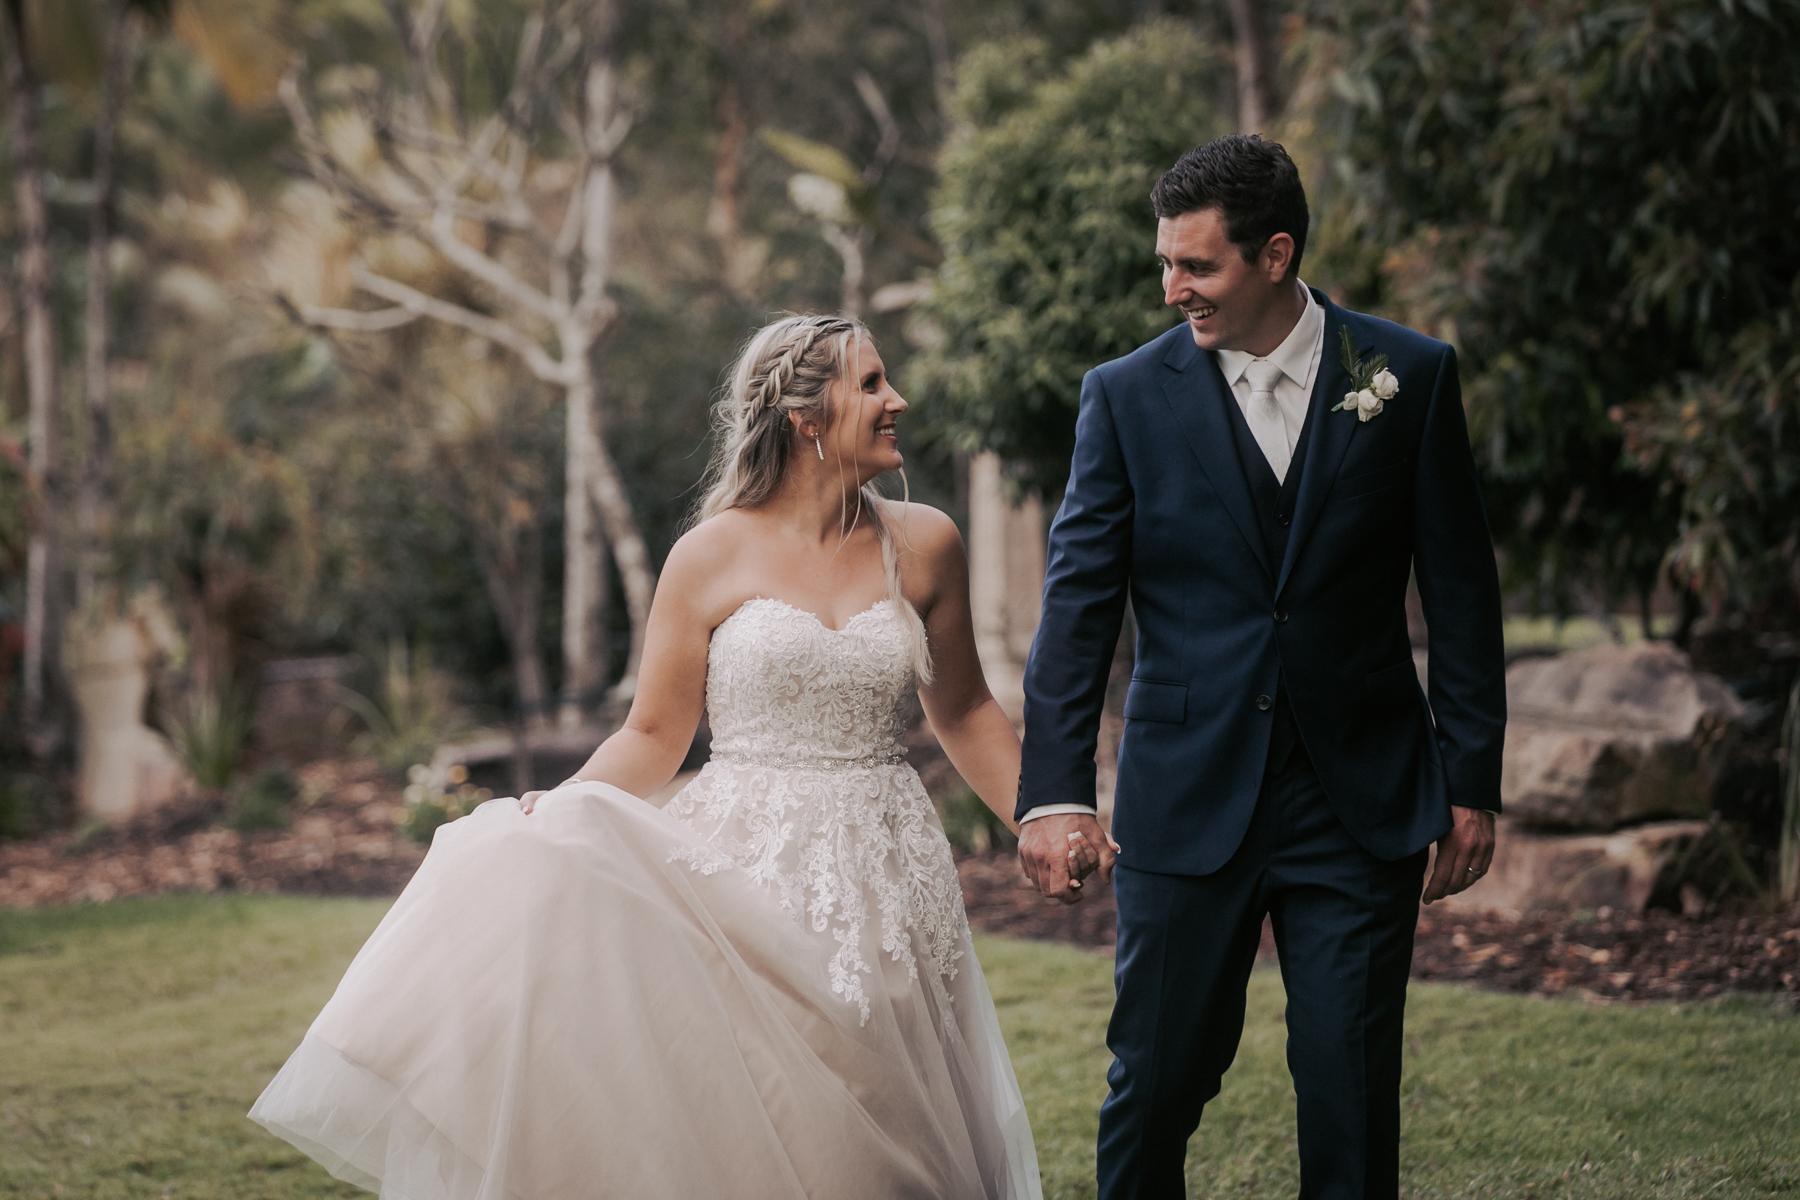 Kangaroo Point wedding photographer